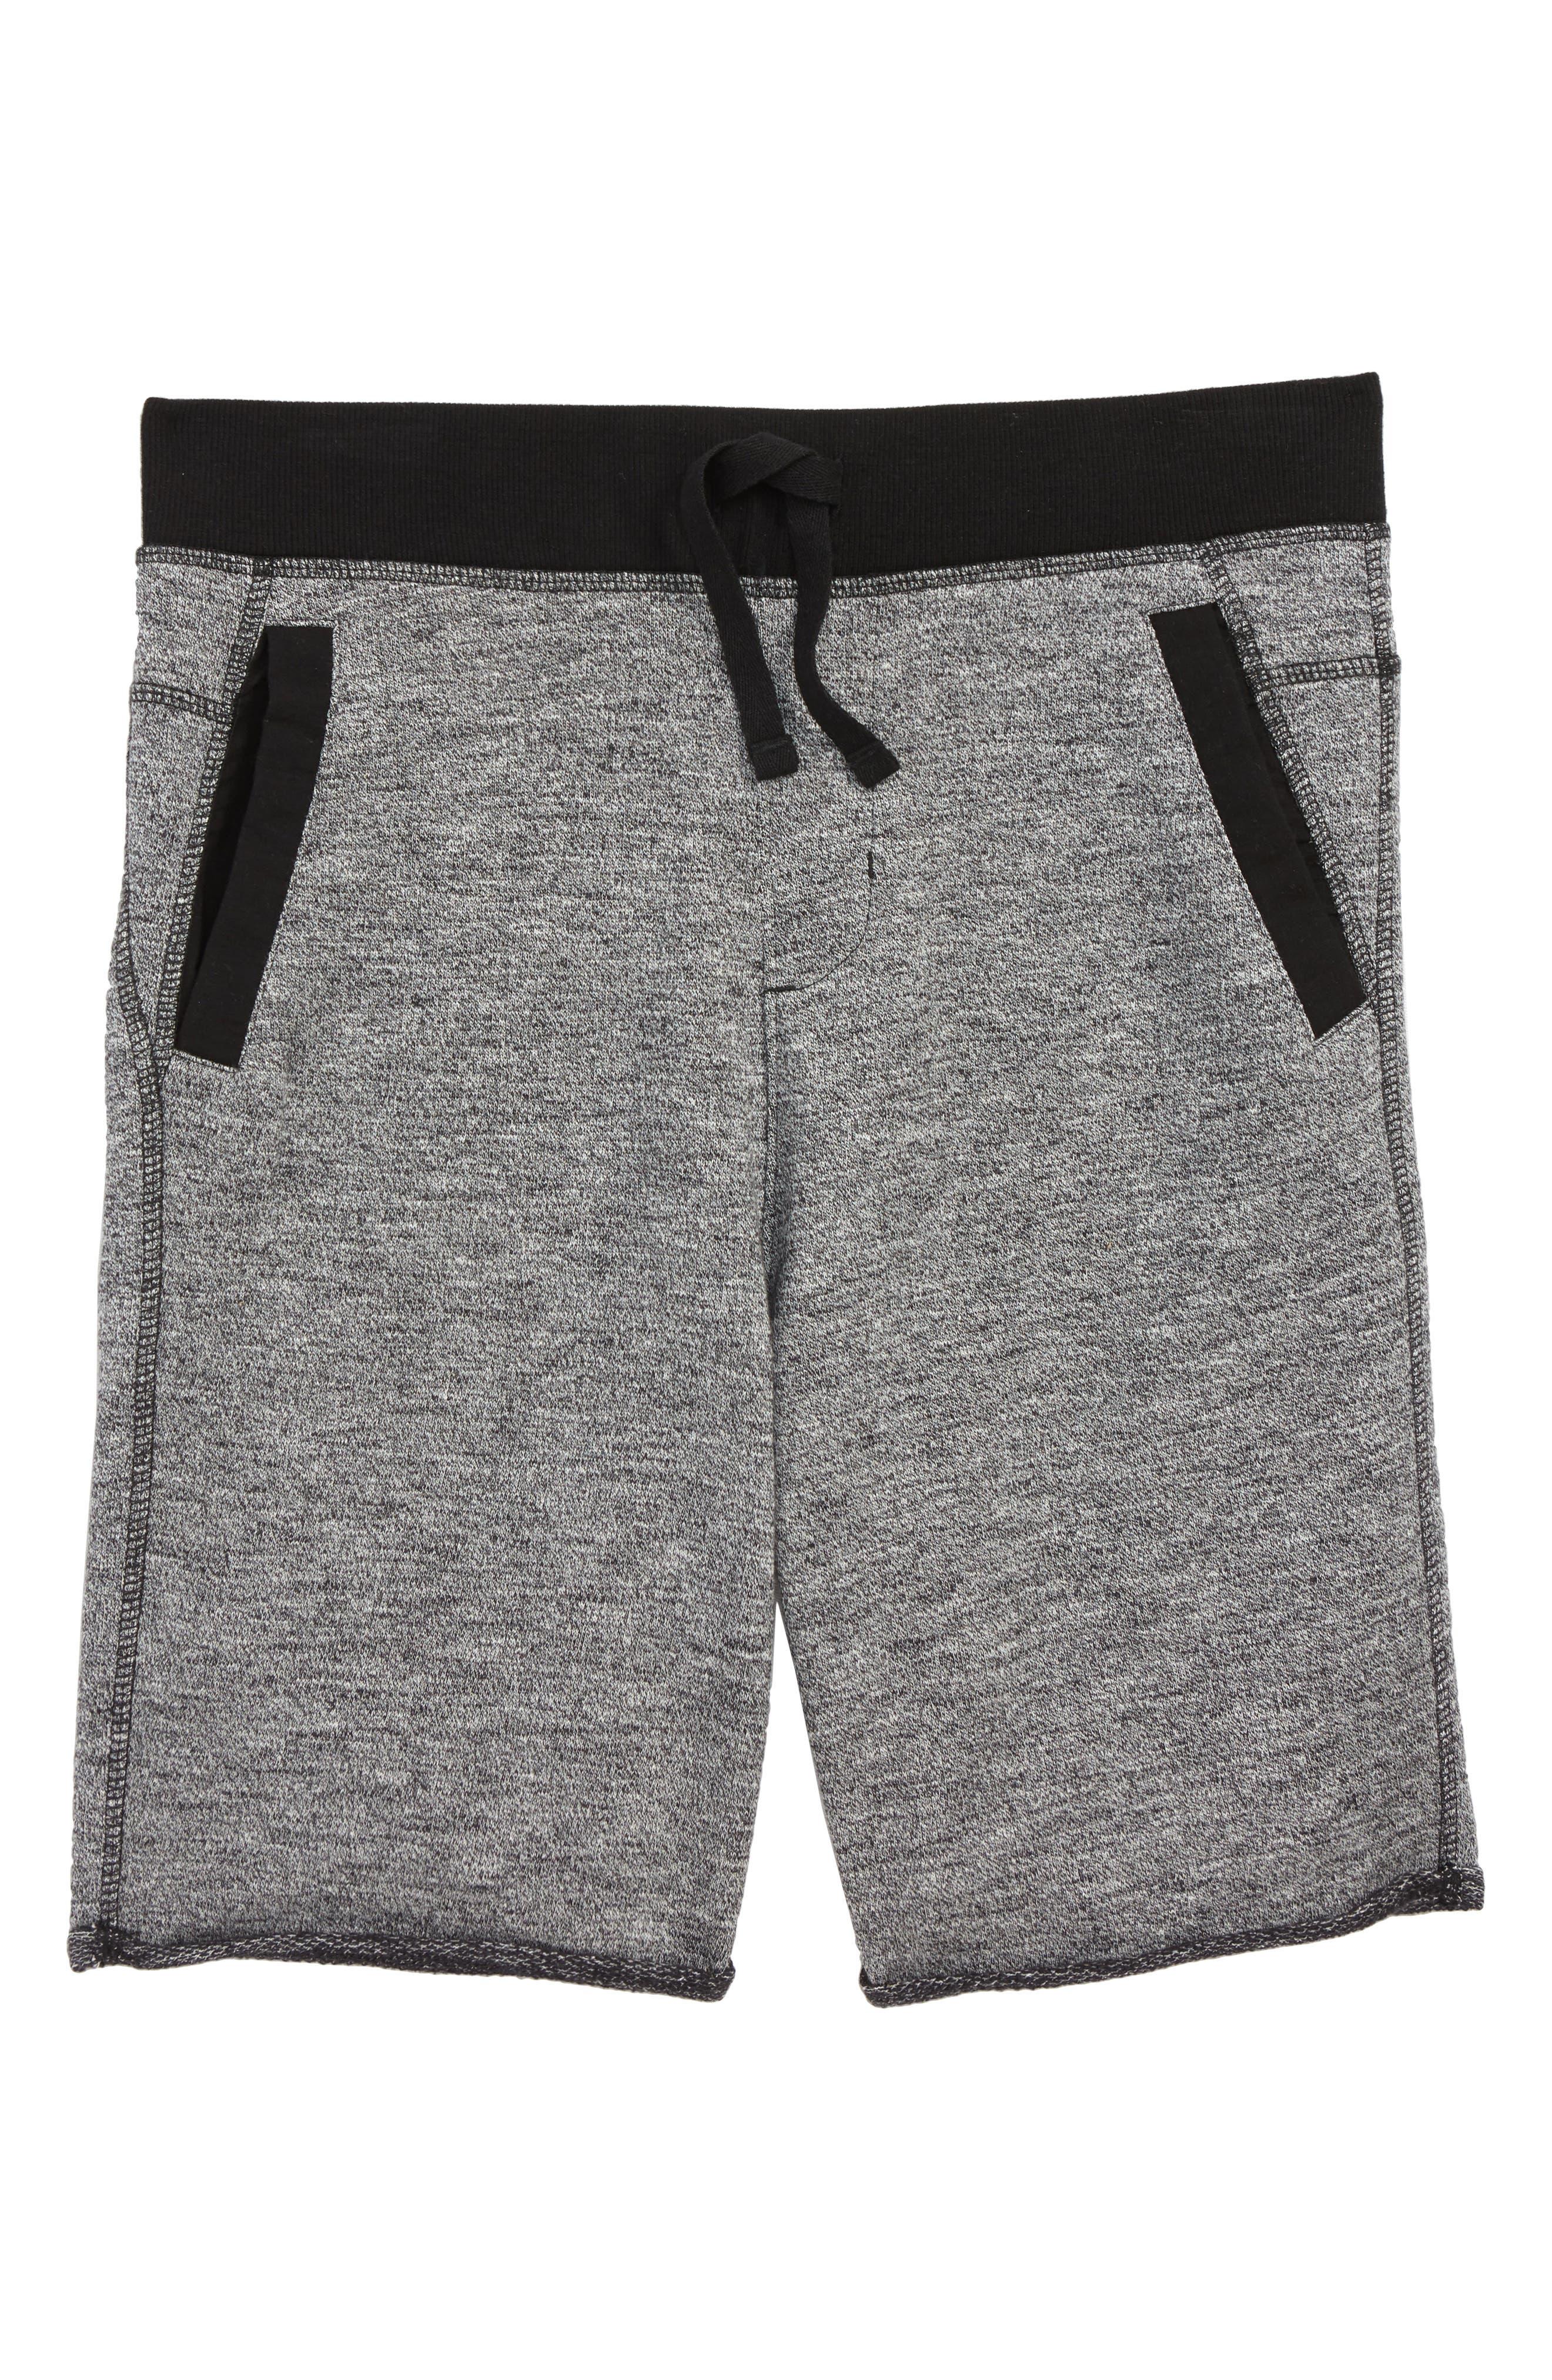 Fleece Knit Shorts,                             Main thumbnail 1, color,                             030